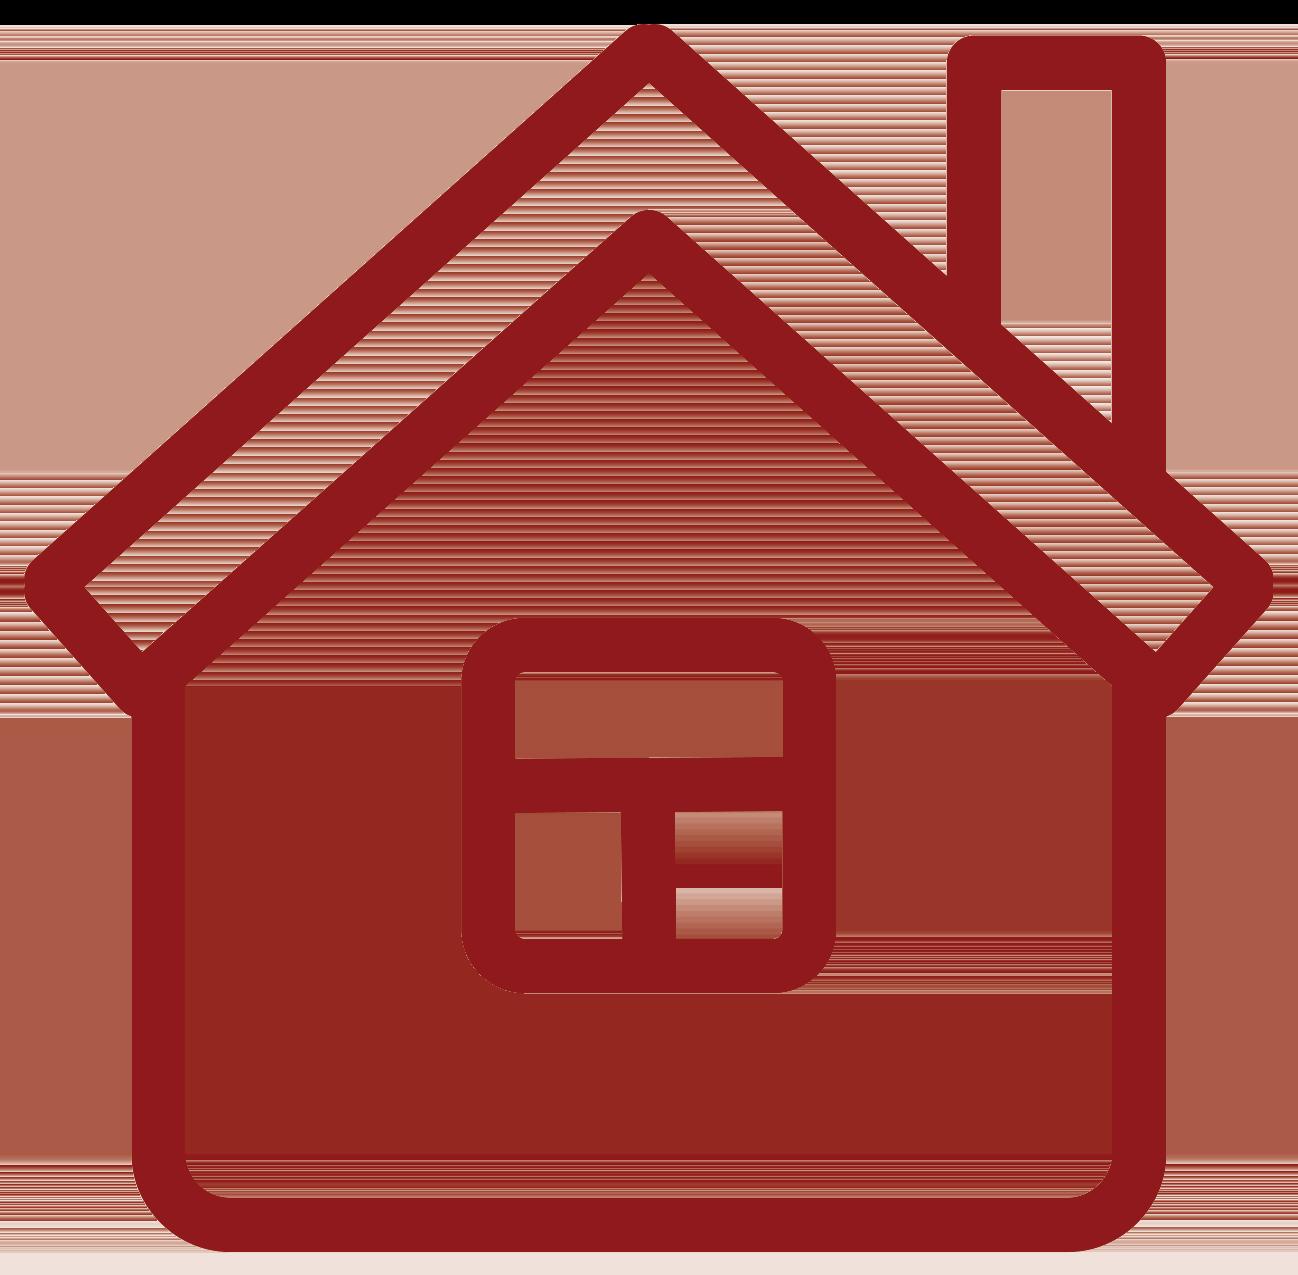 single home icon